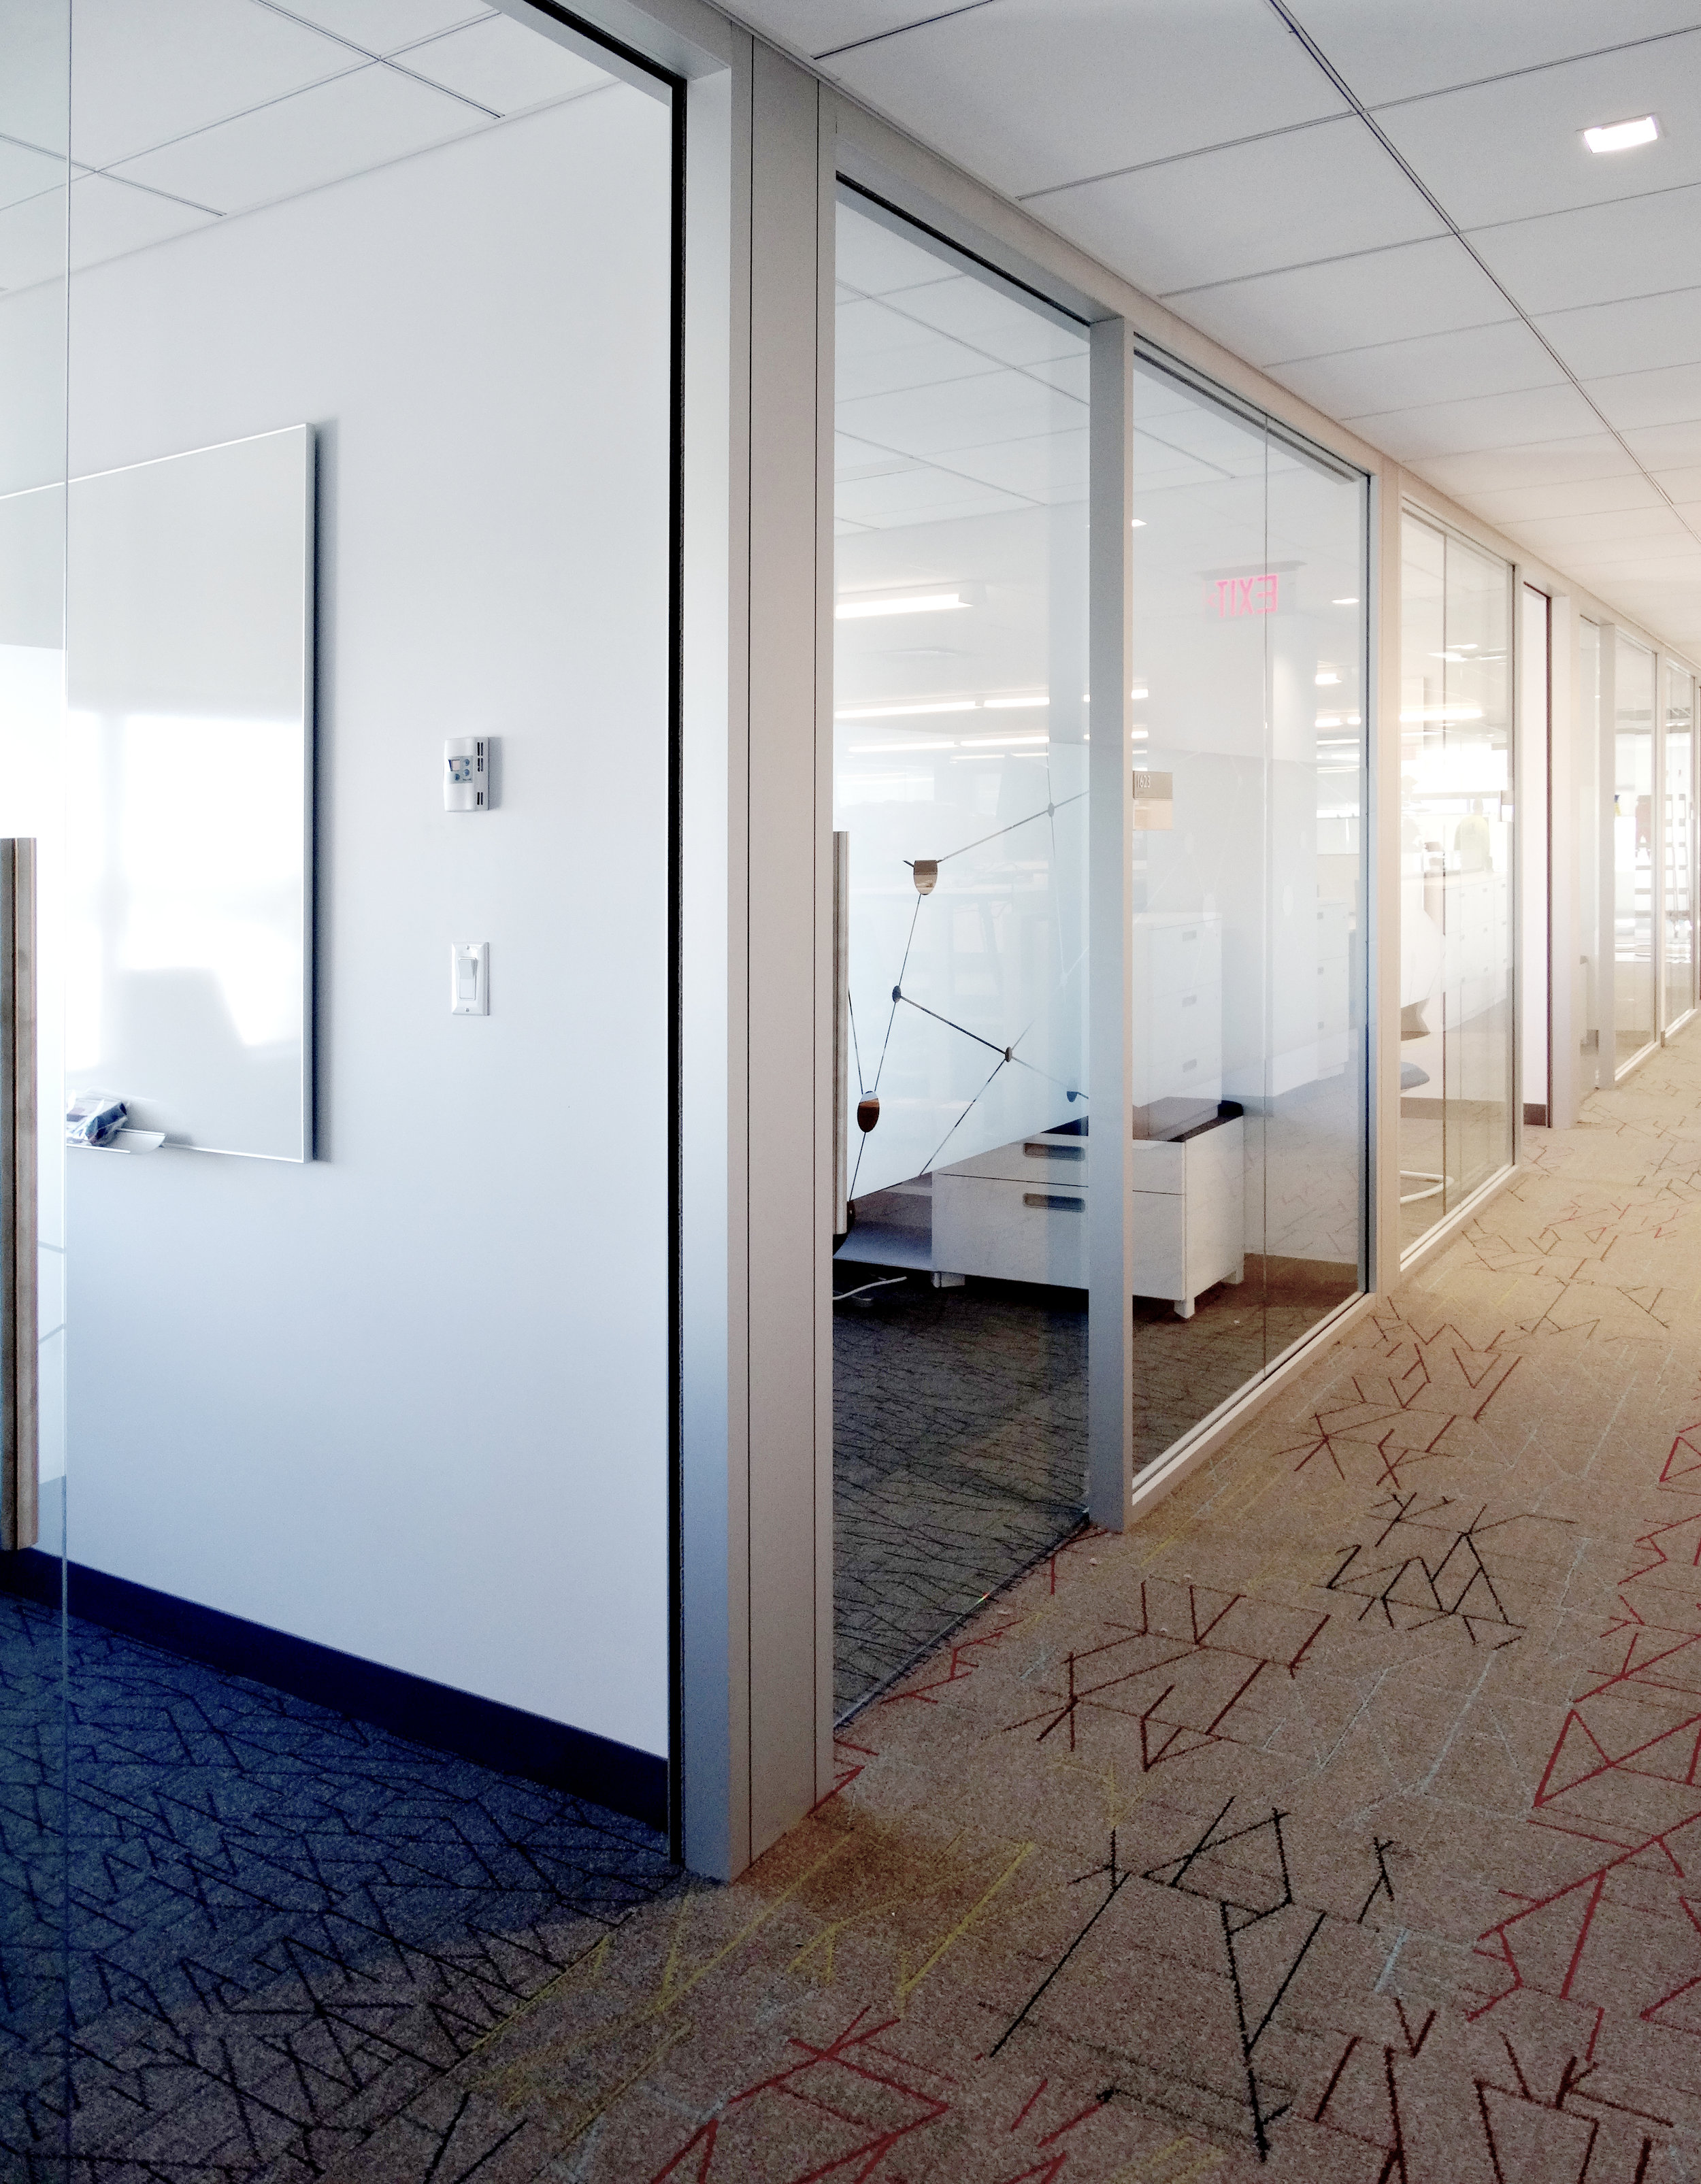 Litespace Demountable Glass BioTech Walls - Spaceworks AI.jpg